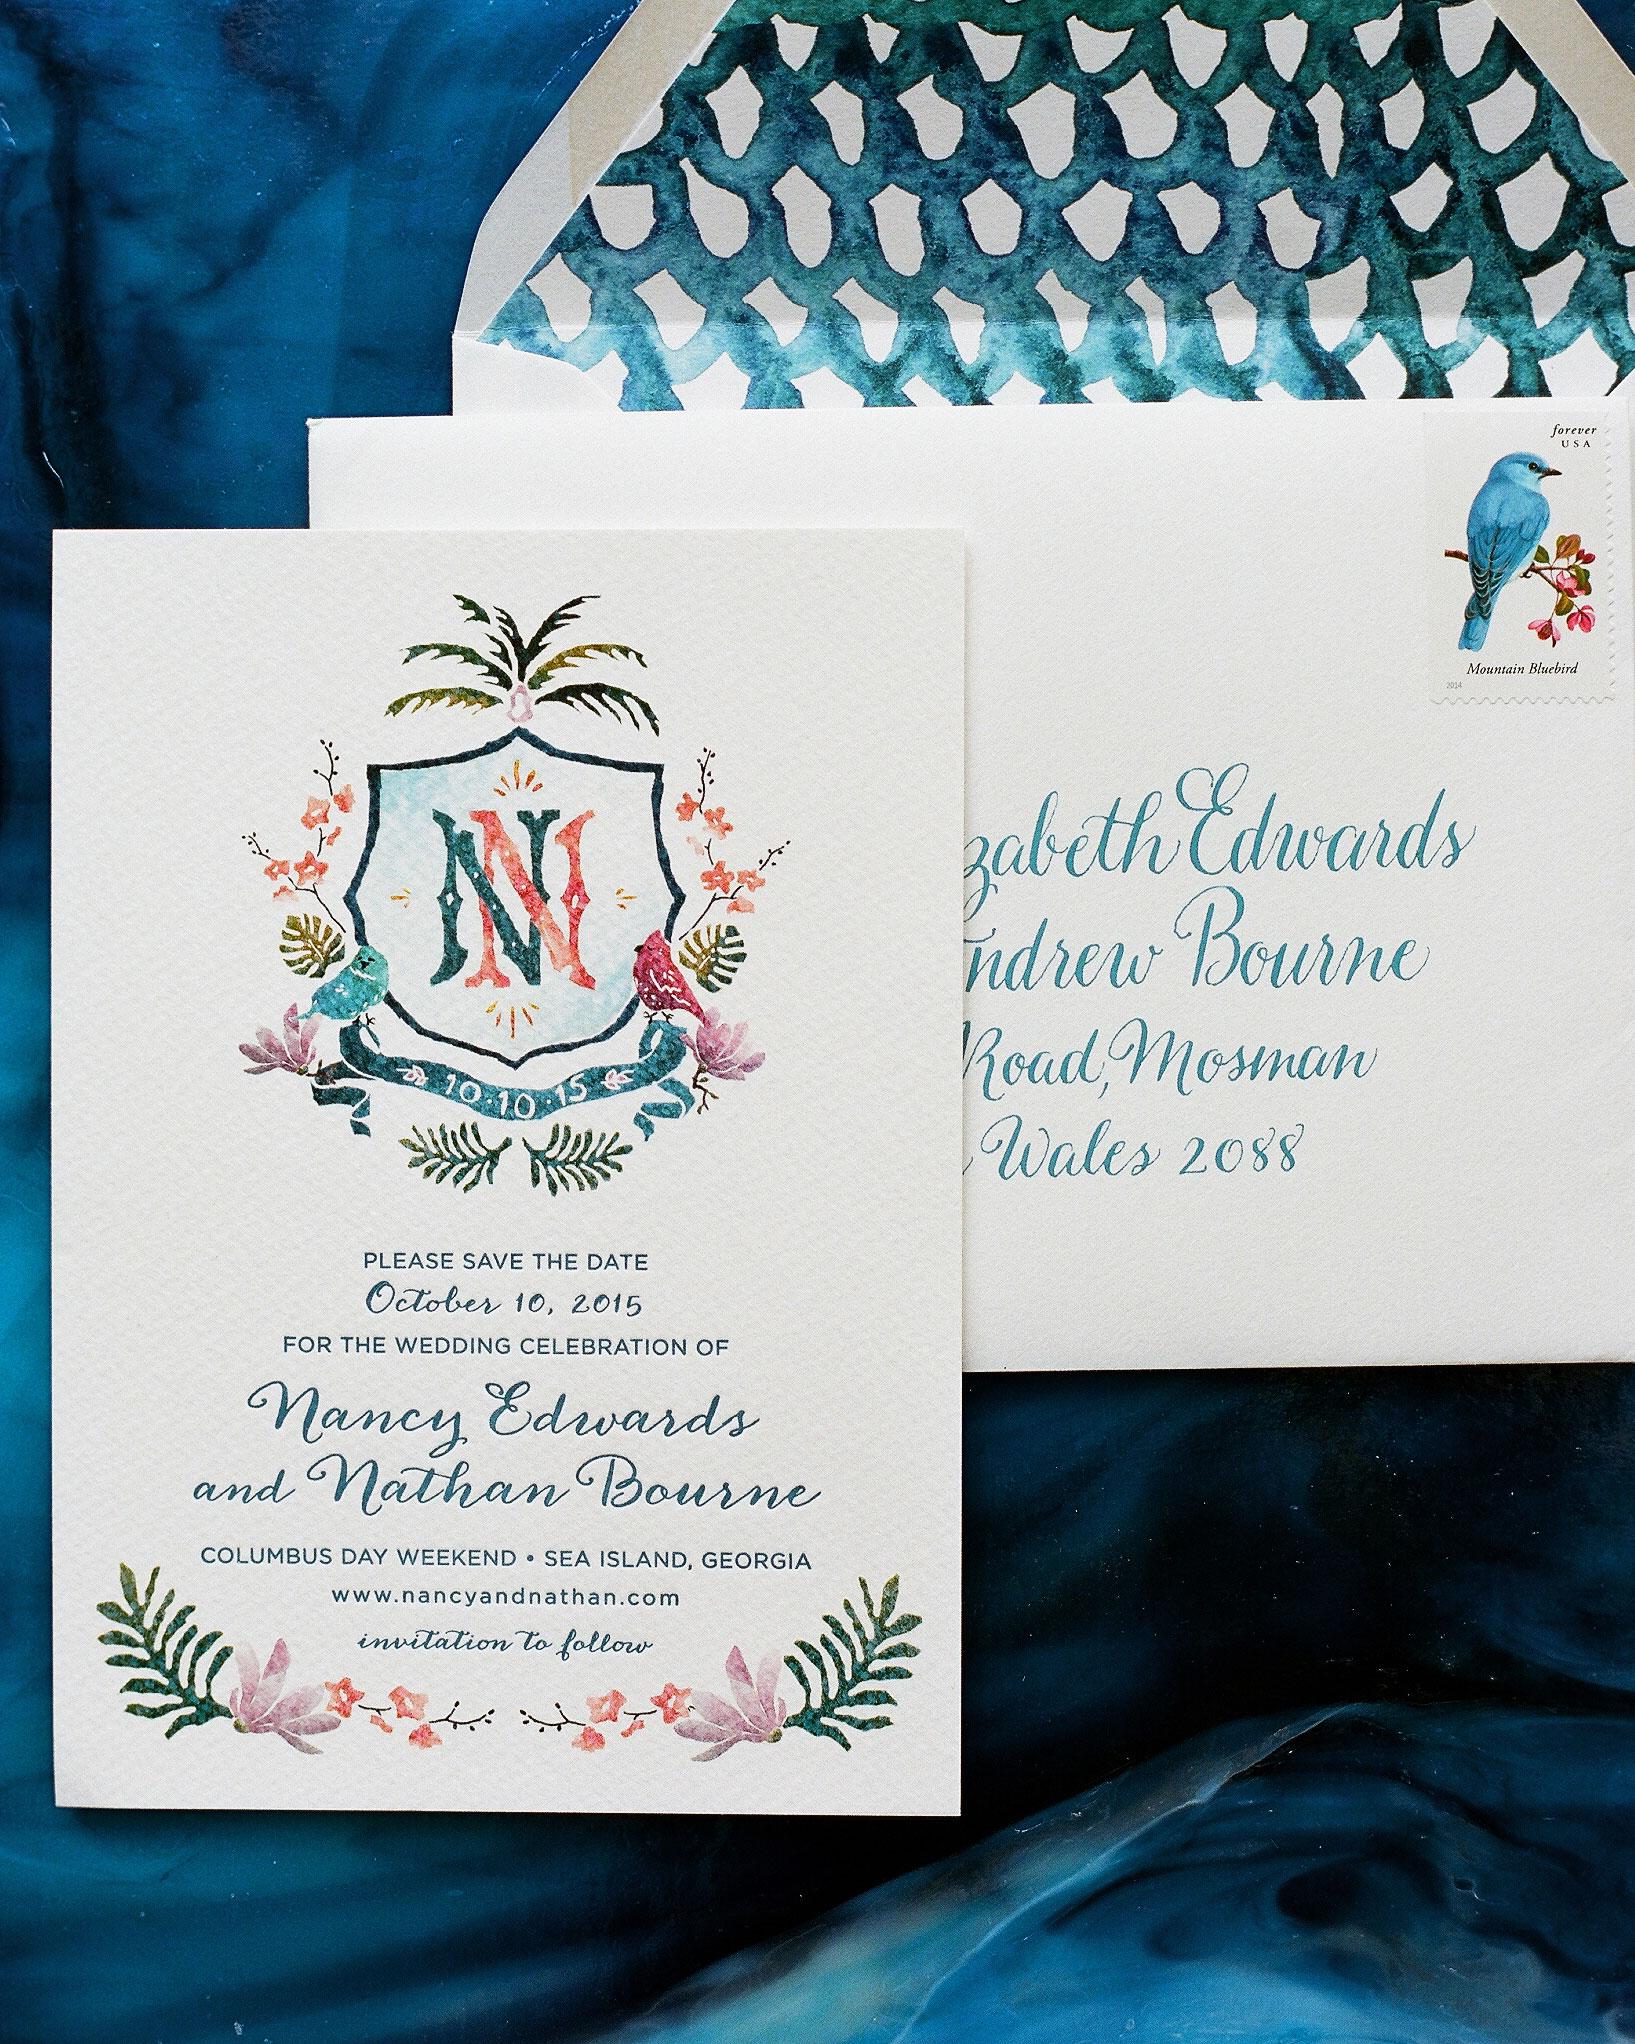 nancy-nathan-wedding-std-0002-6141569-0816.jpg